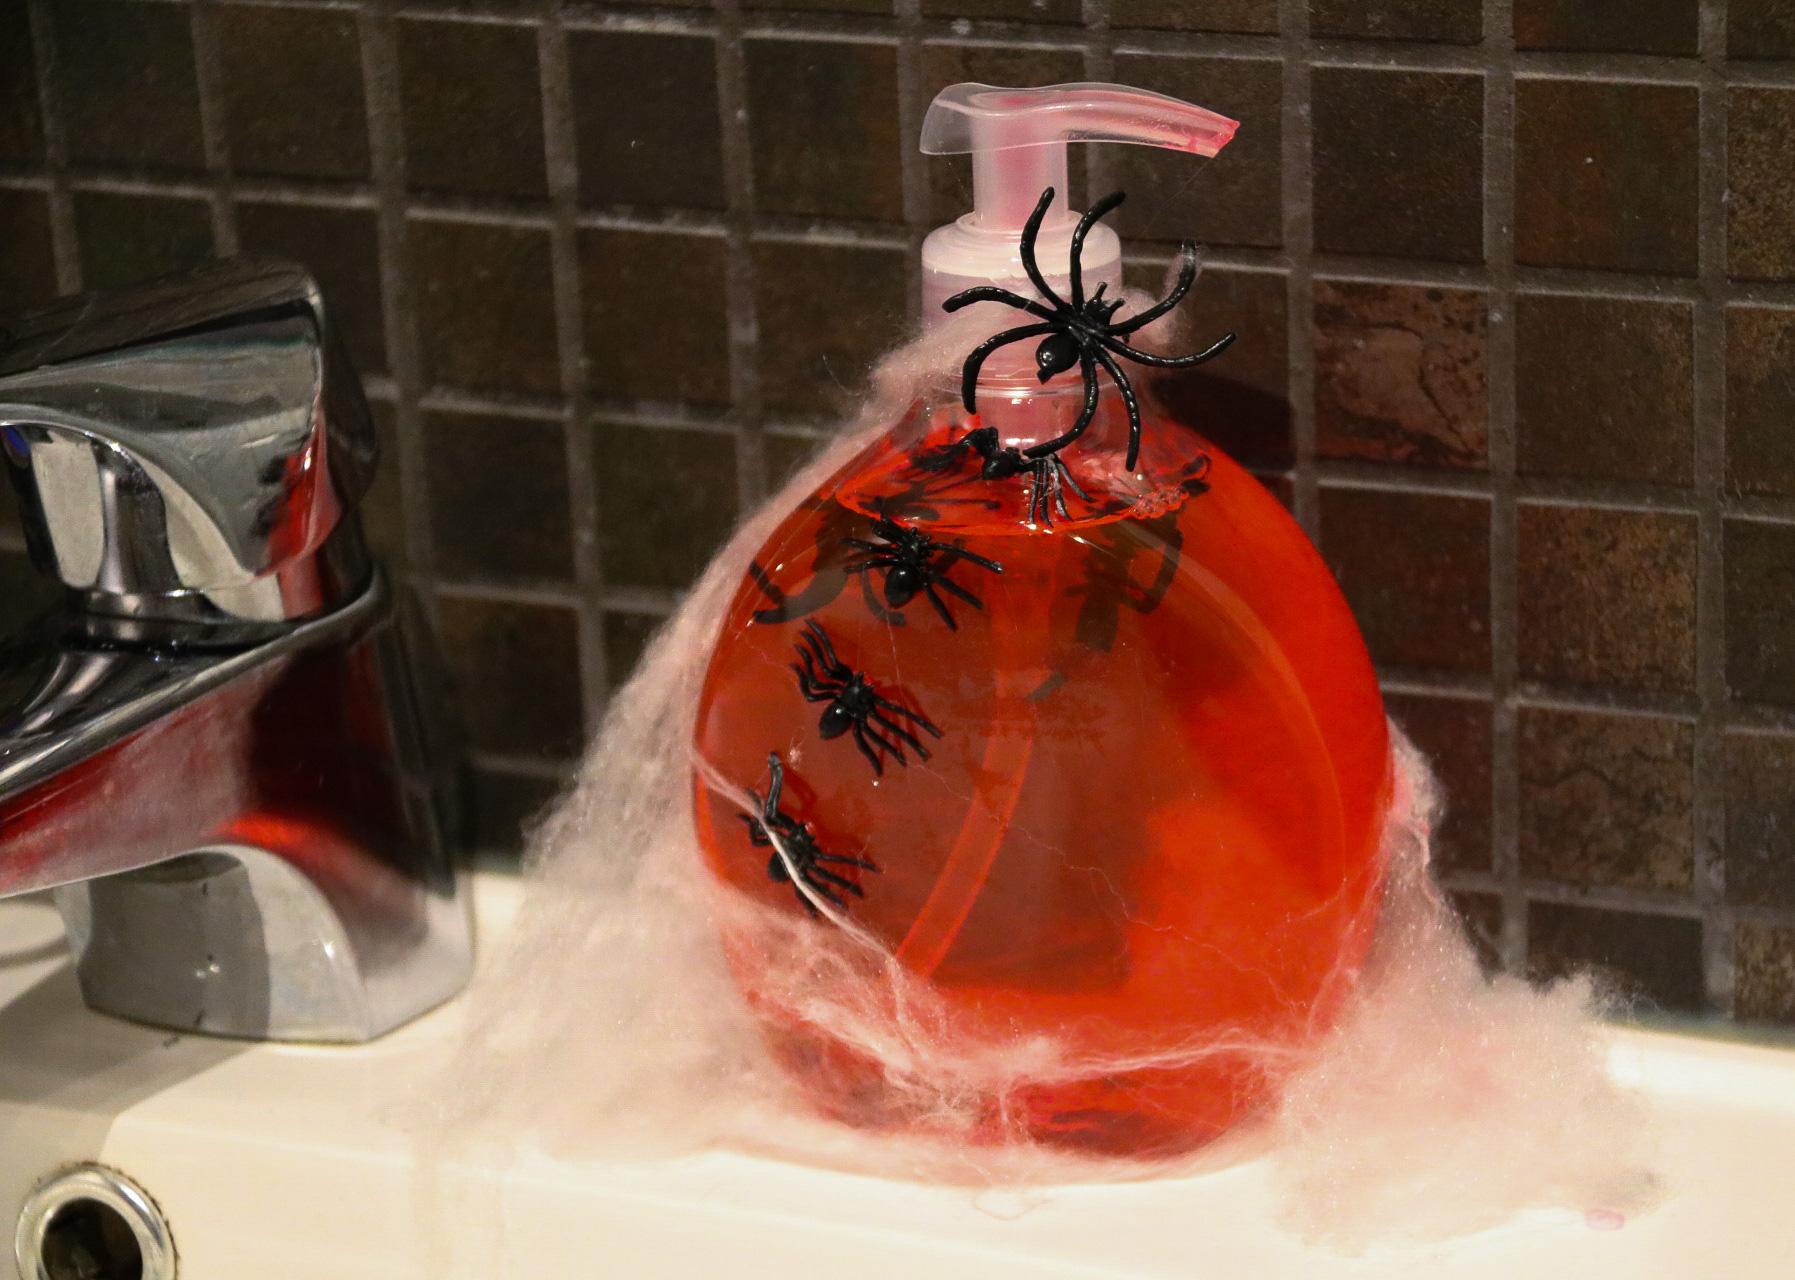 Halloweenpyssel - fixa tvålen